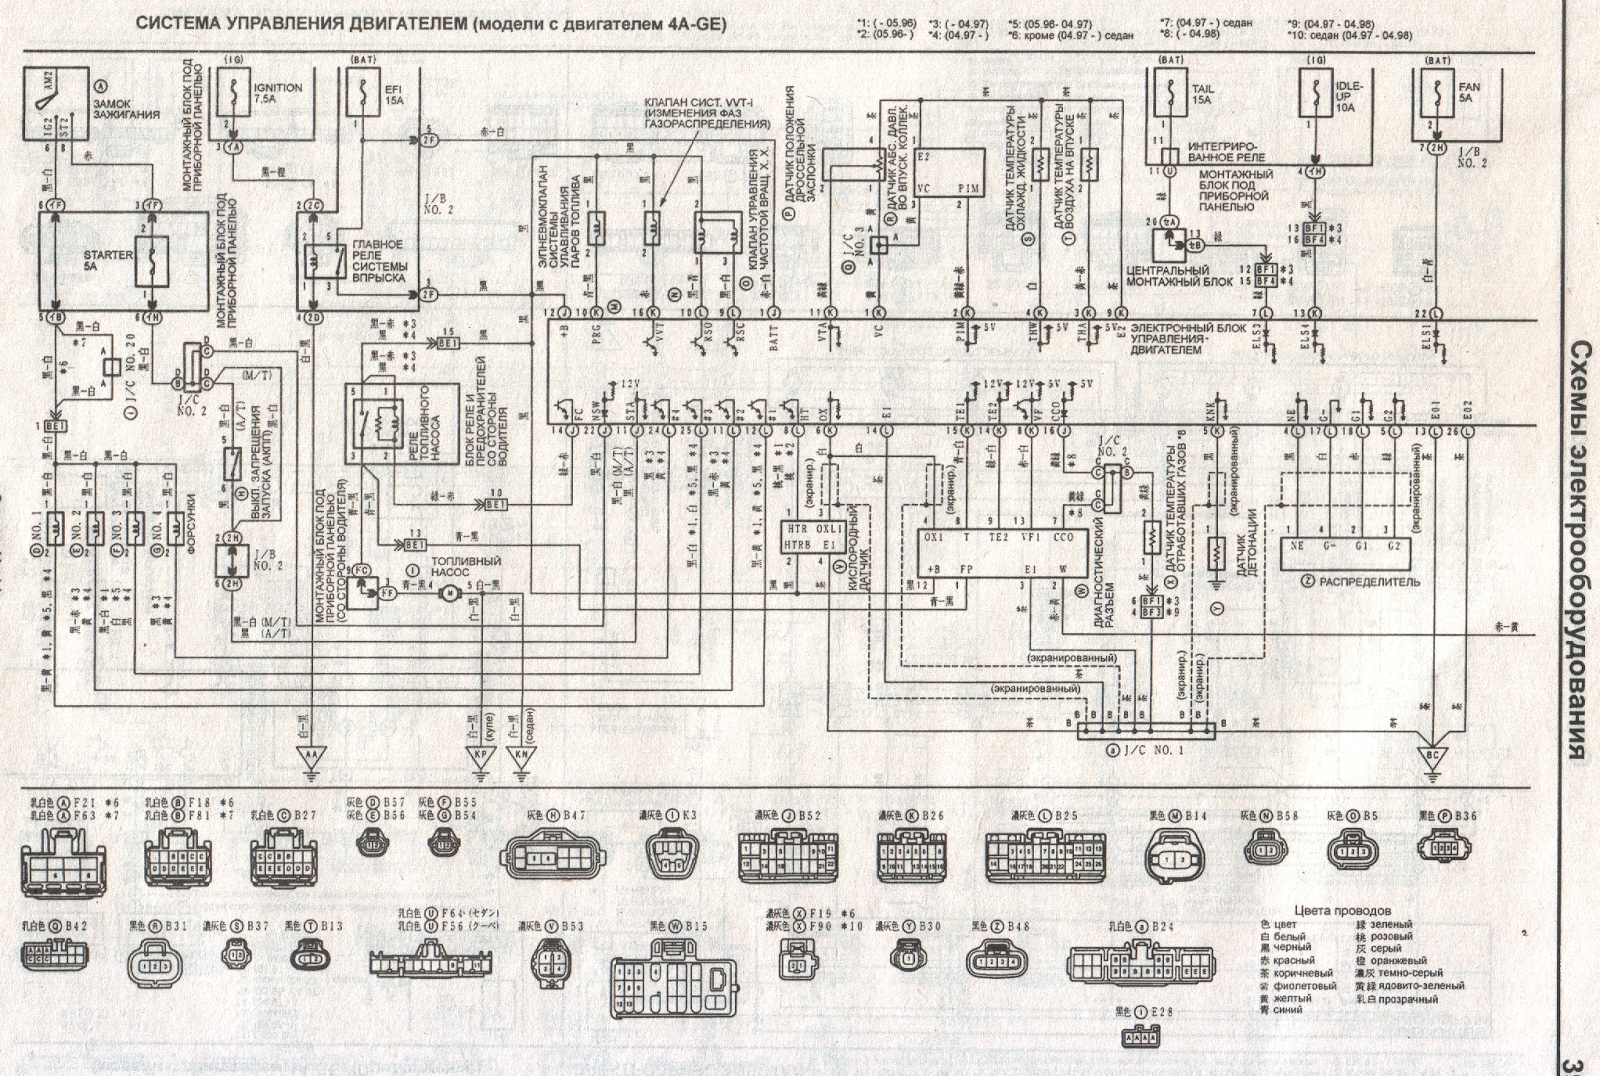 4age blacktop wiring diagram 1996 honda civic dx stereo me2kimi blogspot